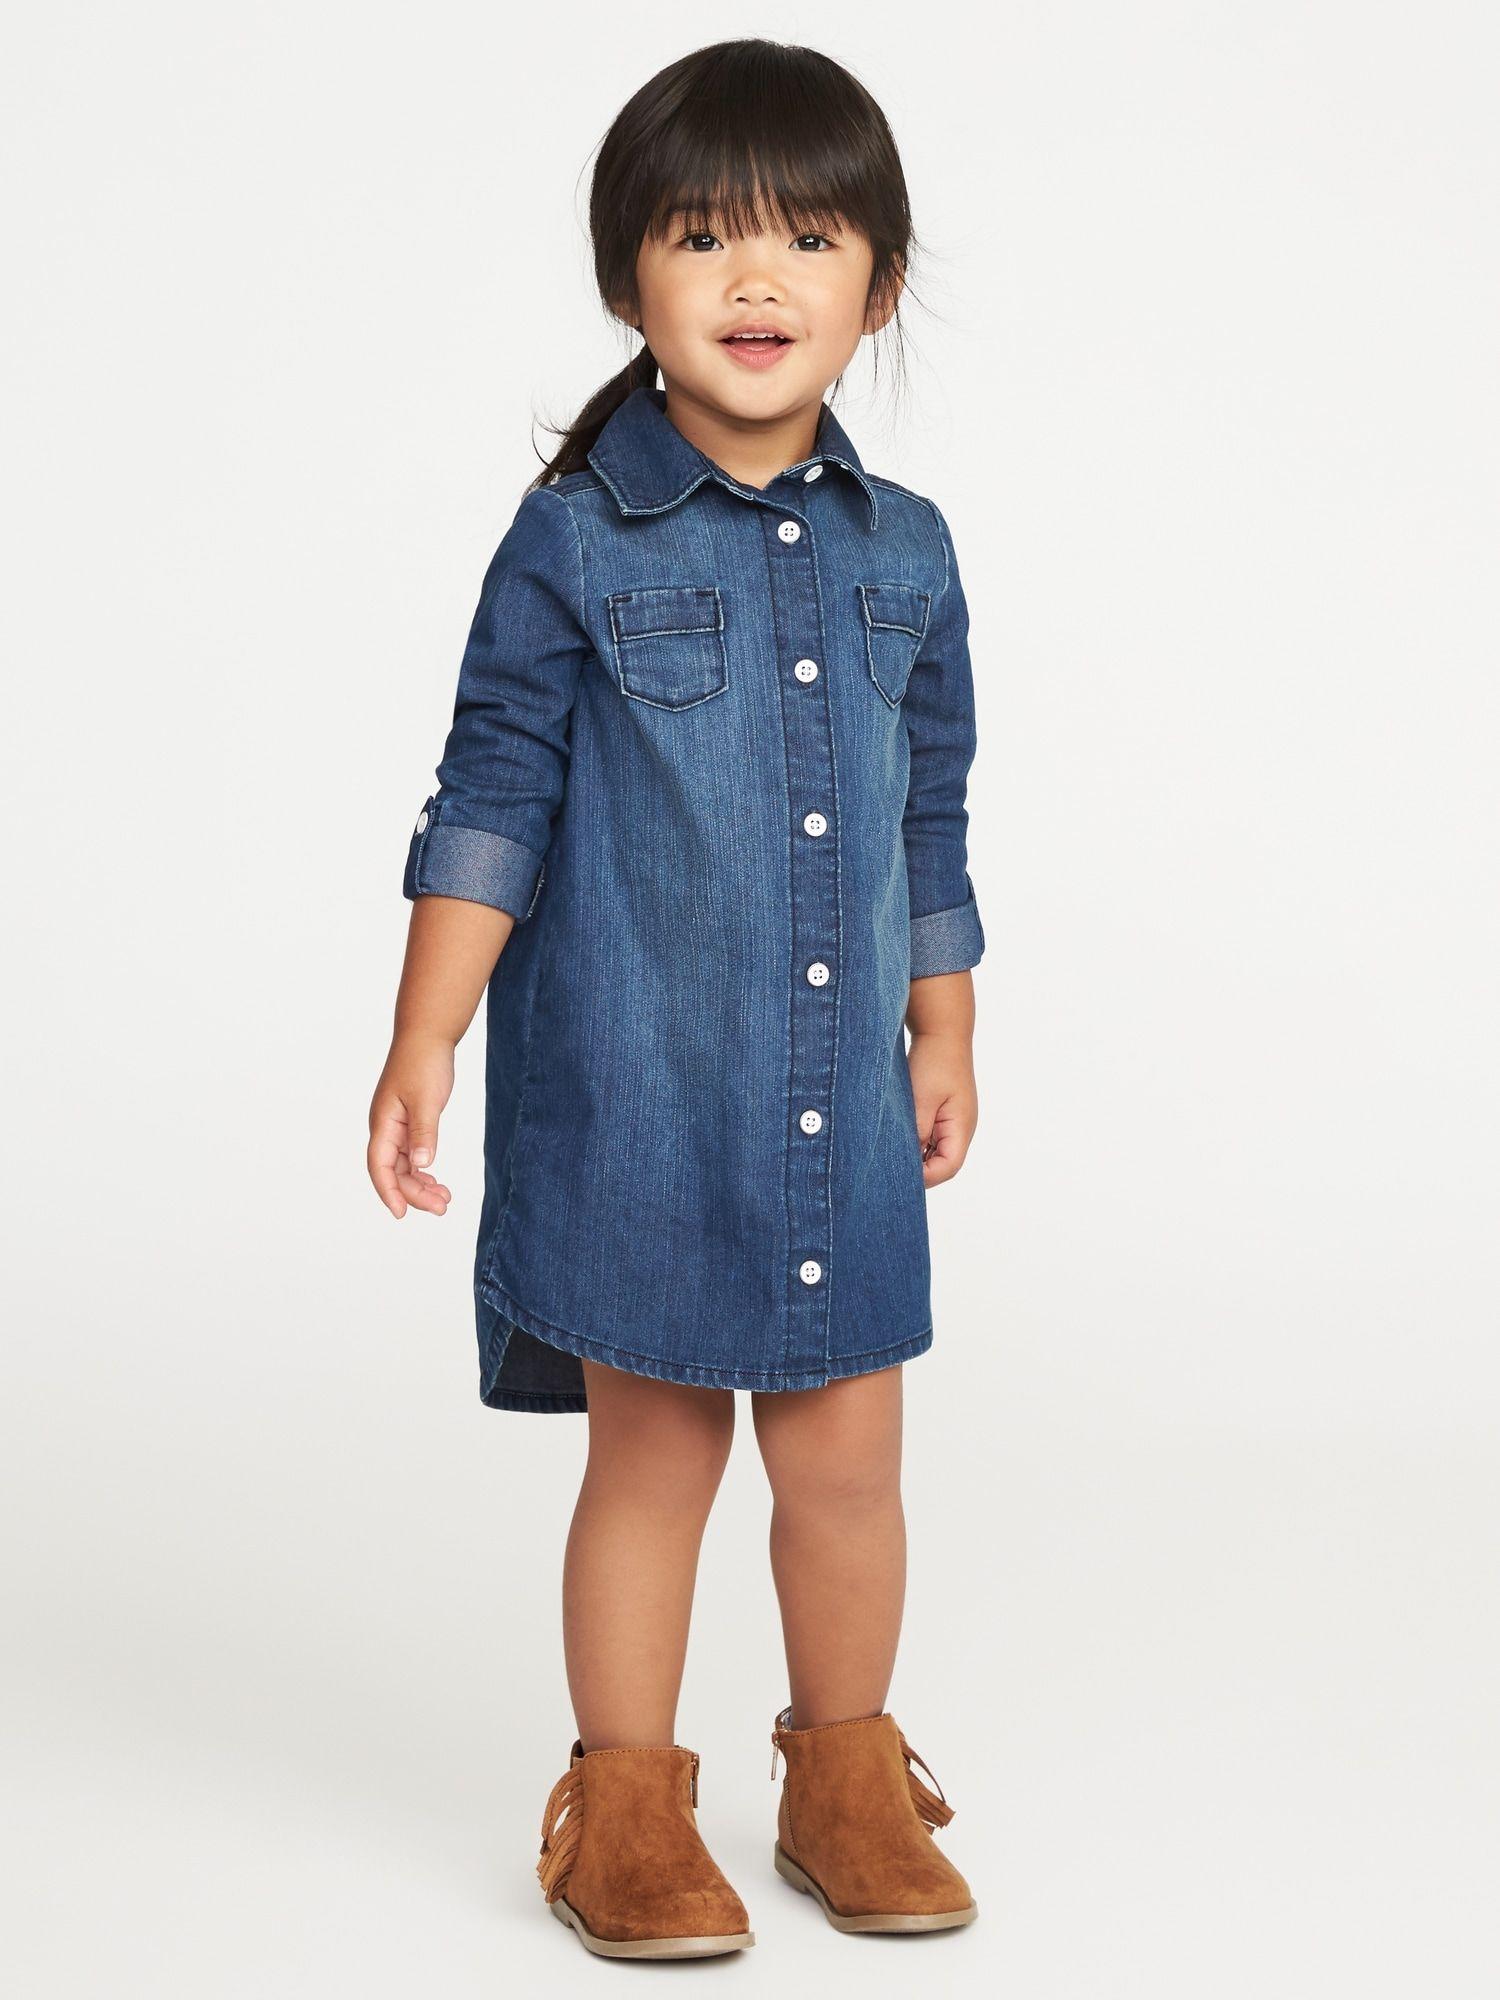 22+ Toddler denim dress info